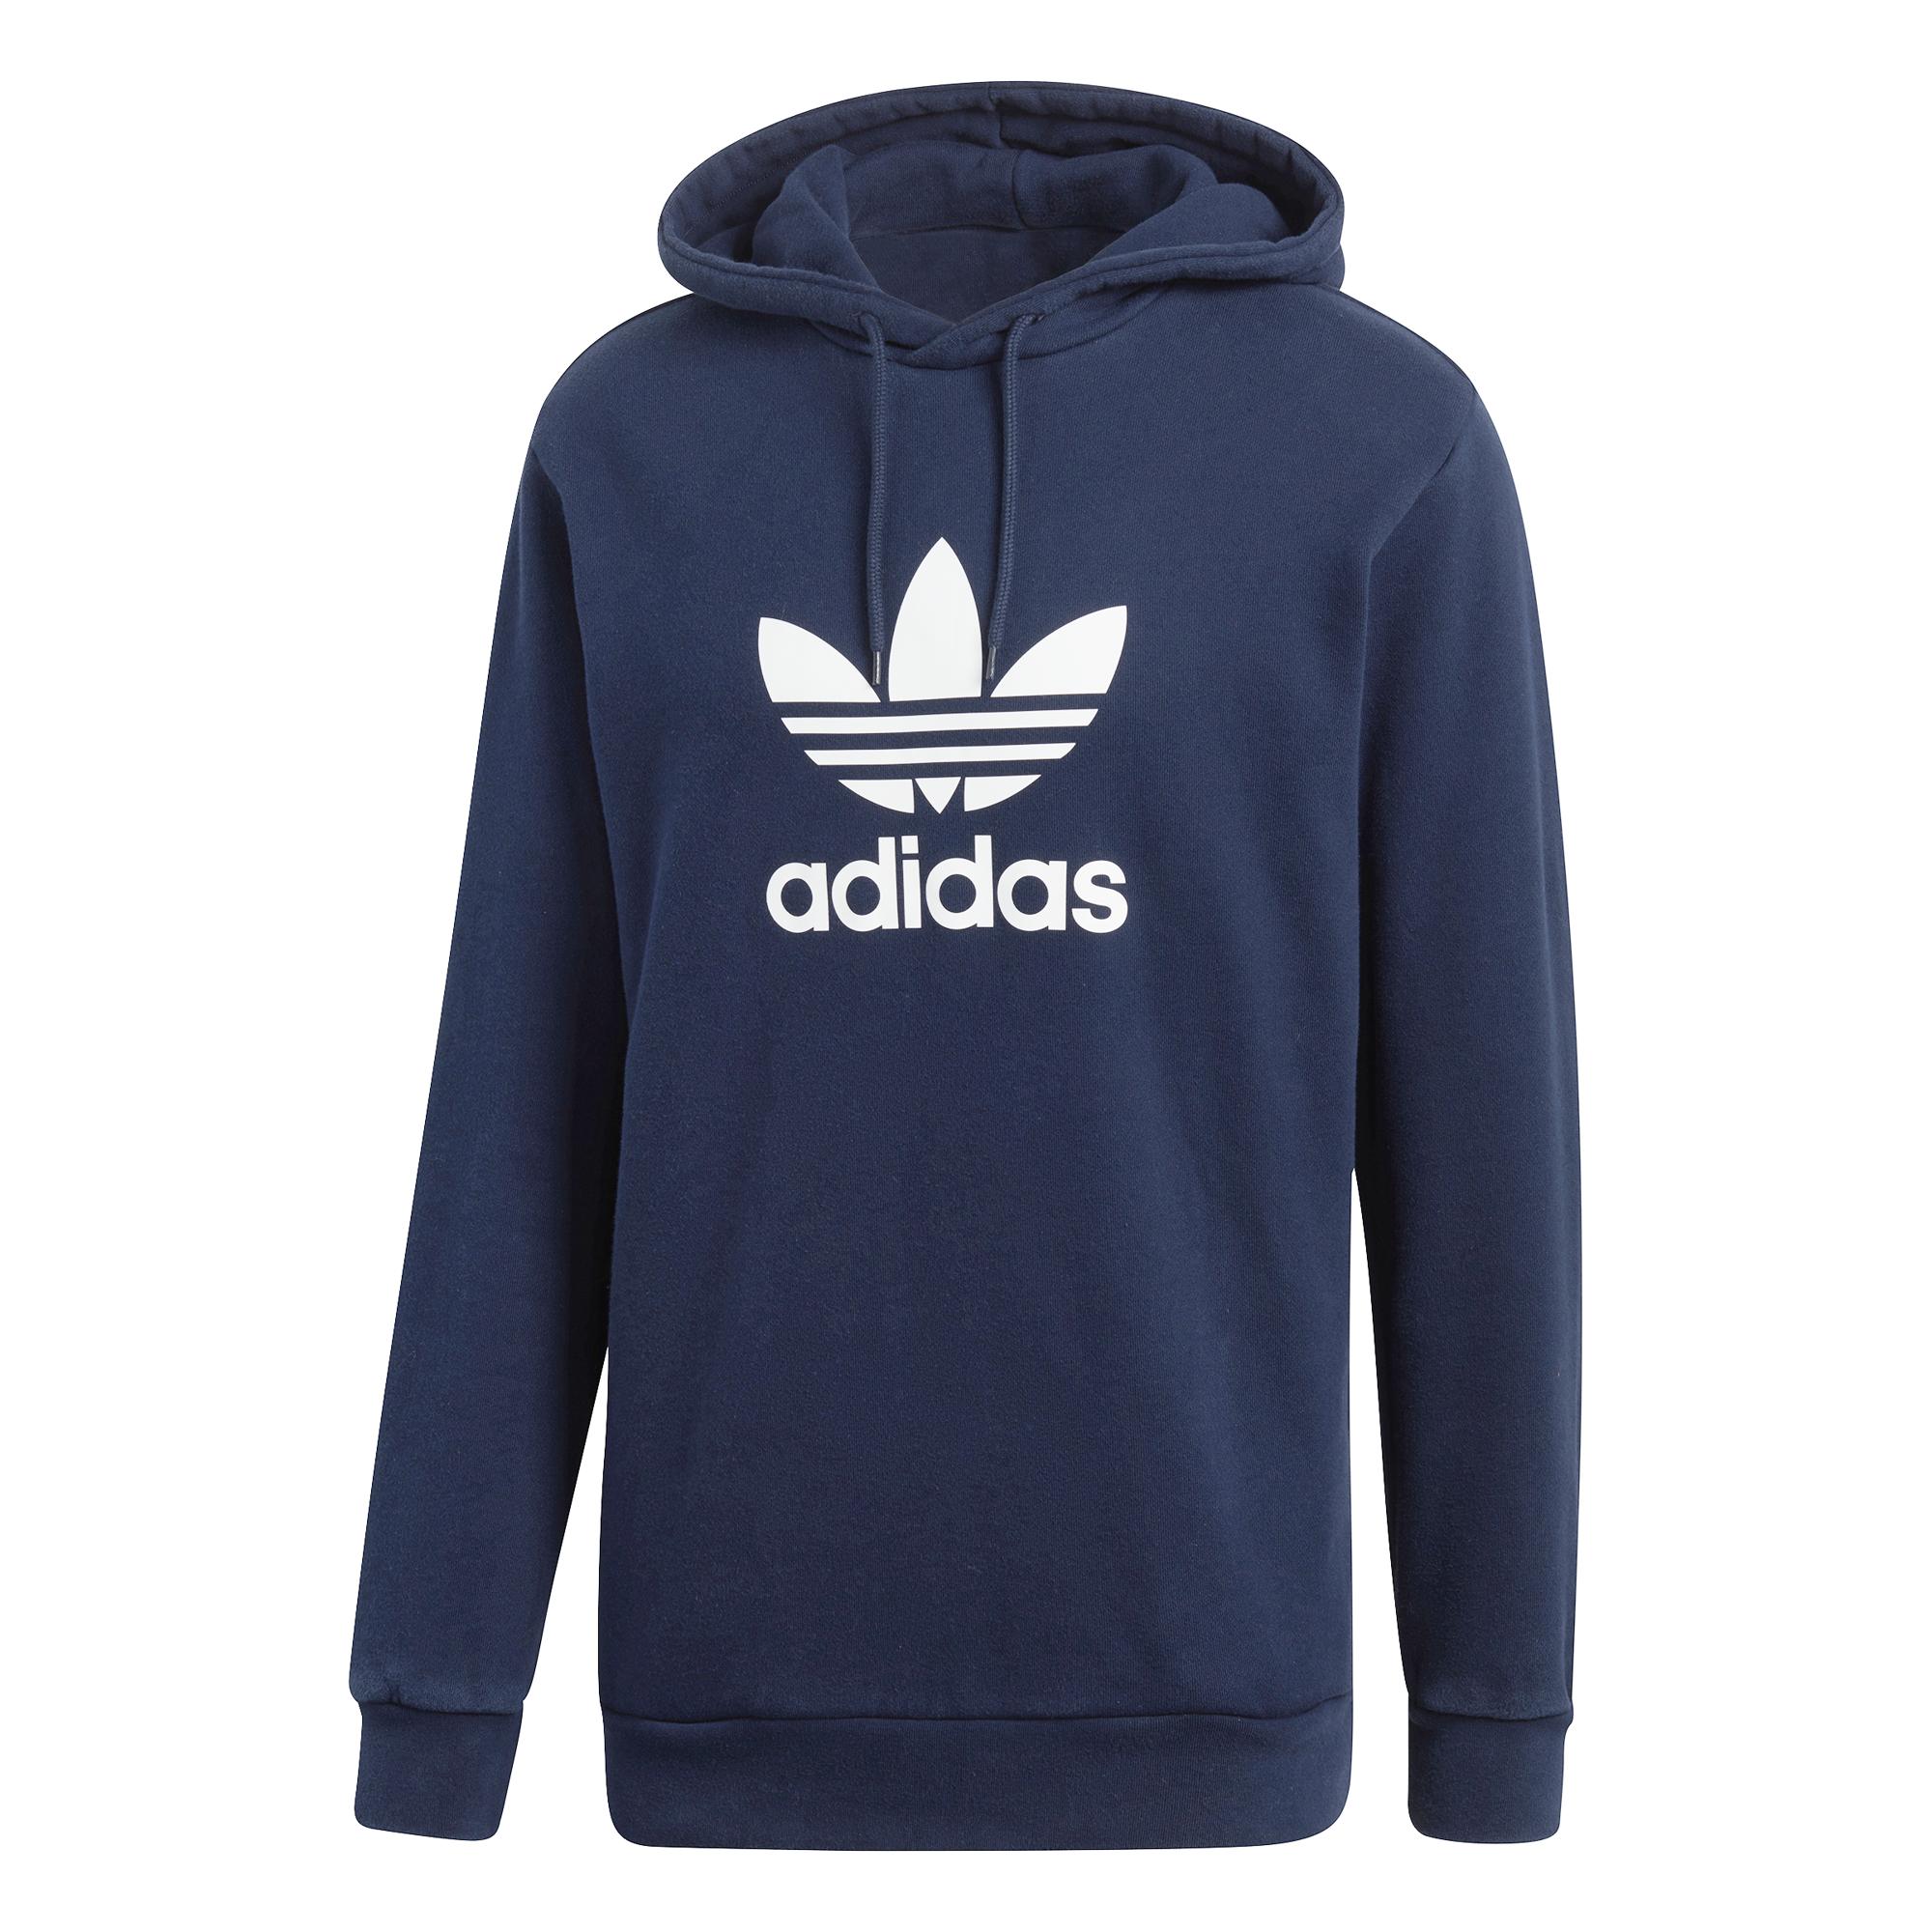 bluza adidas treofil dn6013 granatowy 239 99 zł